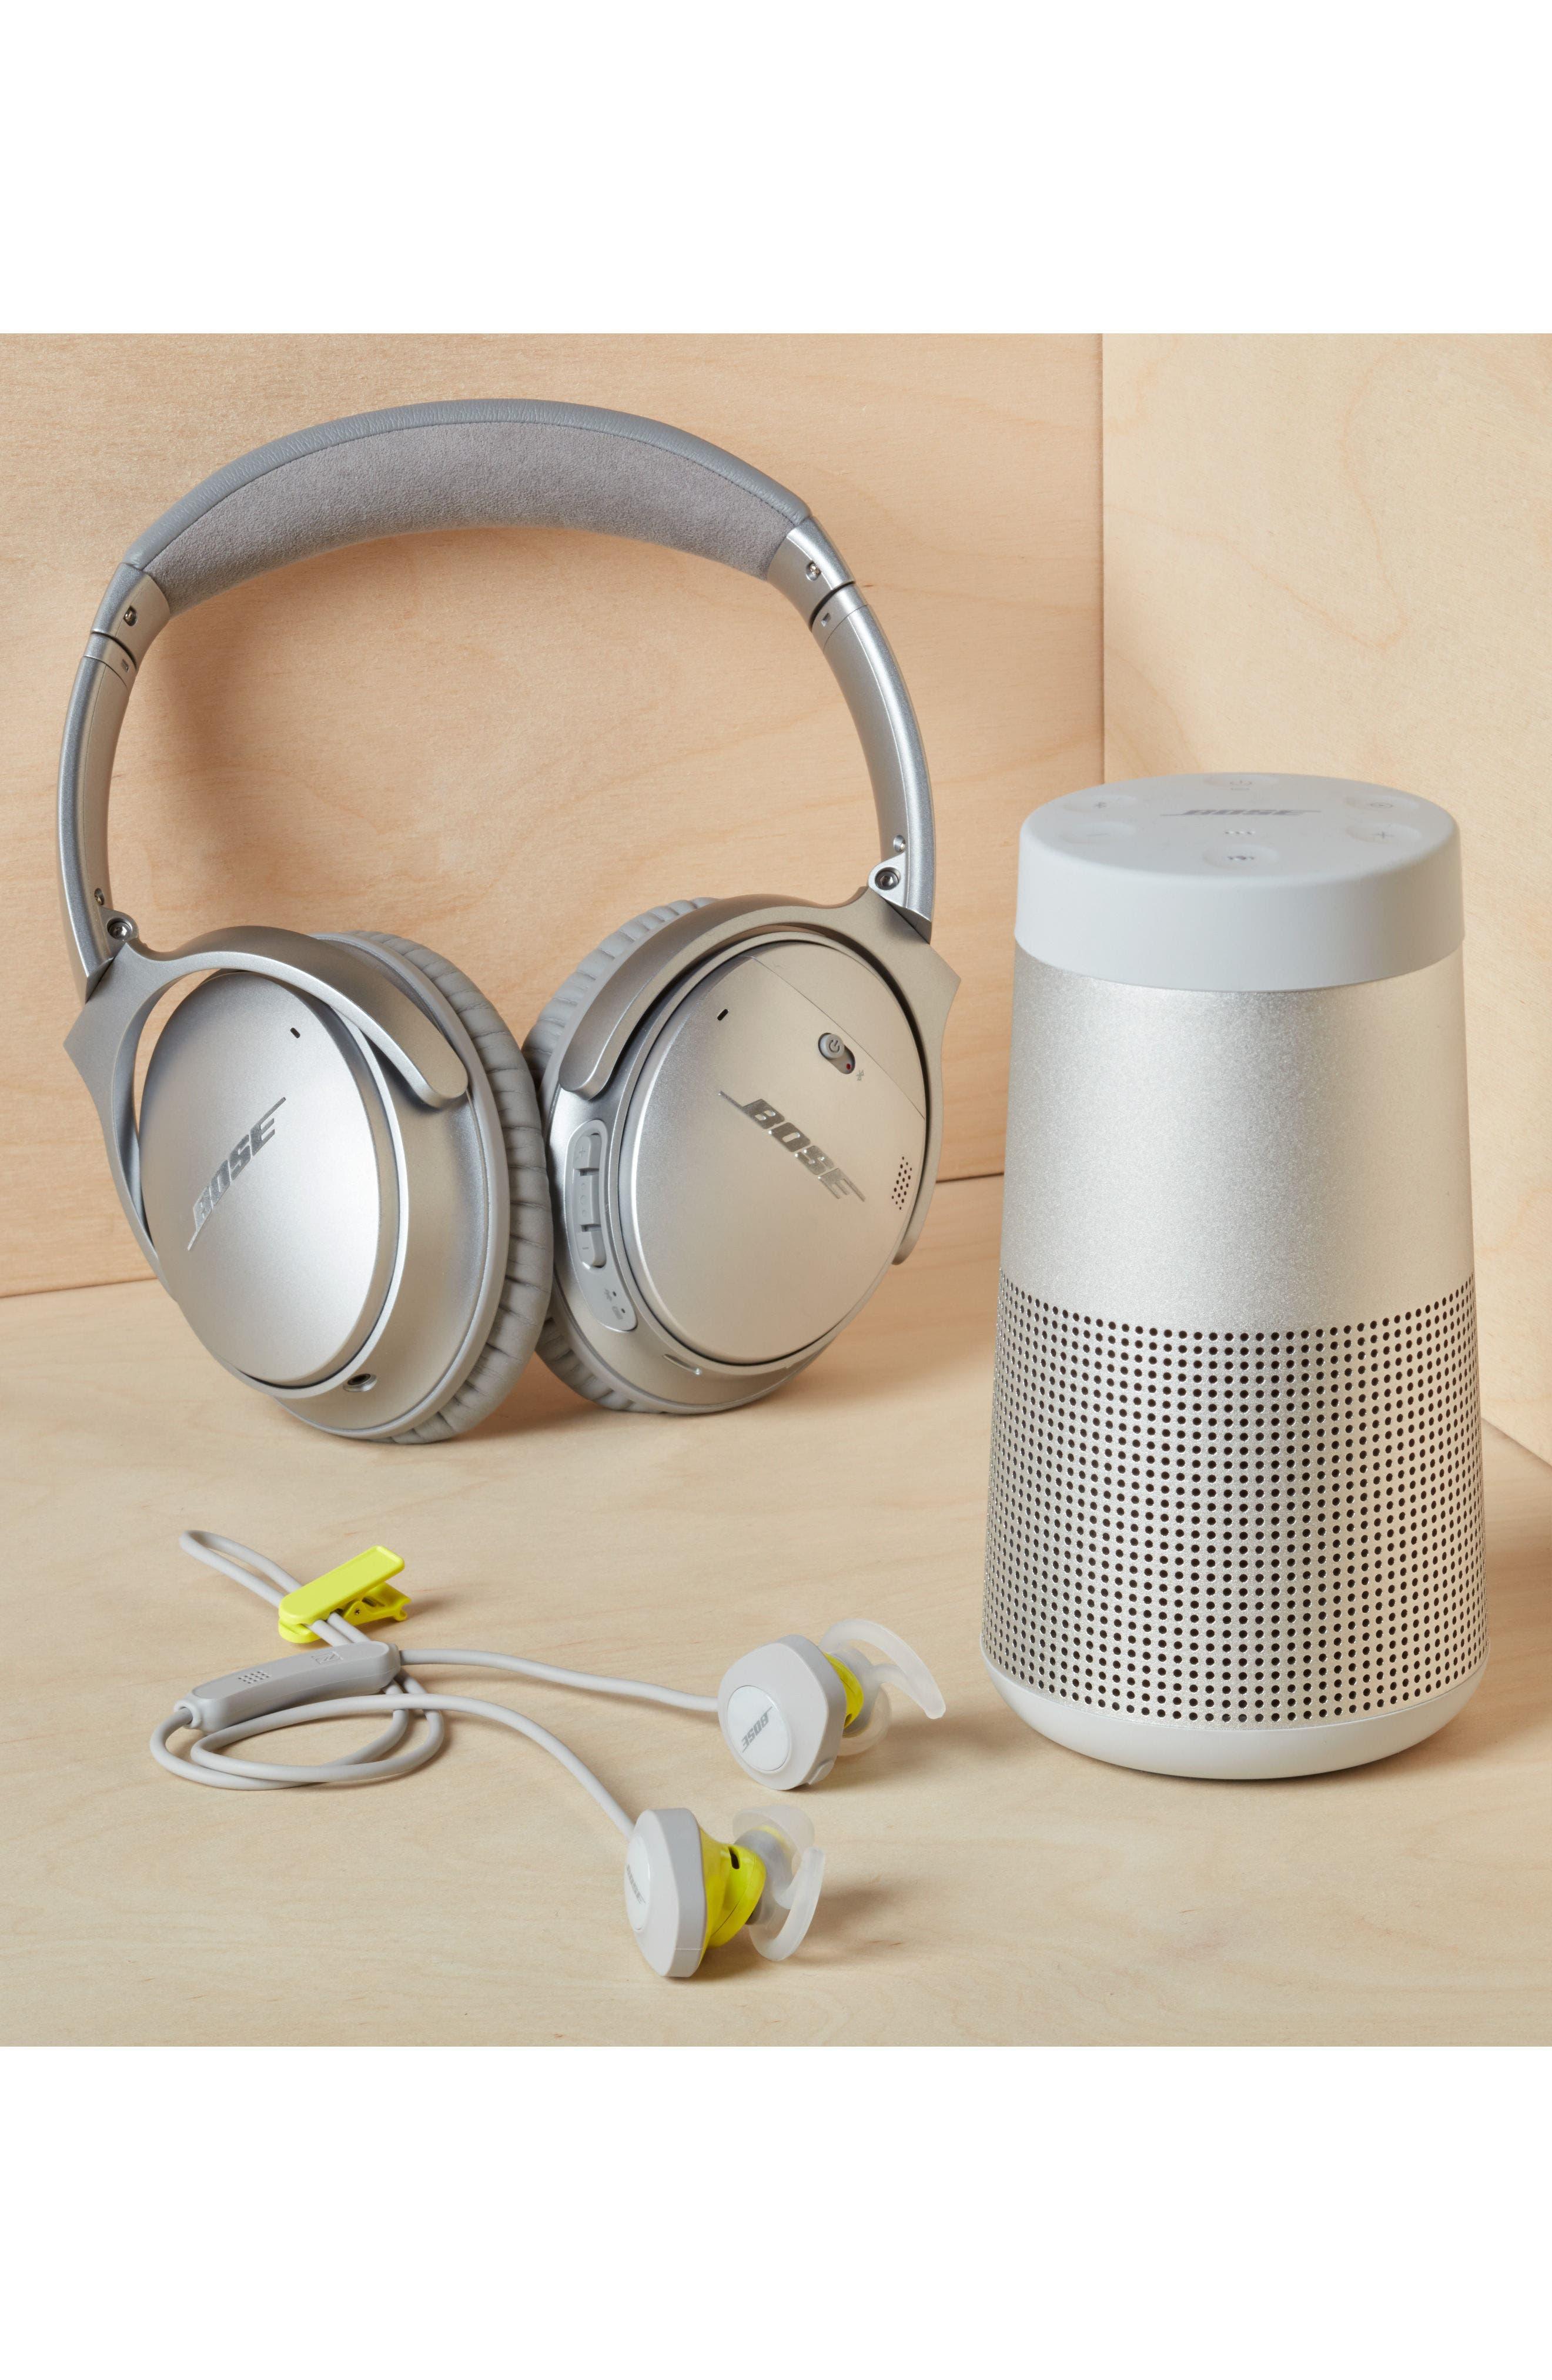 SoundSport<sup>®</sup> Wireless Headphones,                             Alternate thumbnail 5, color,                             Citron